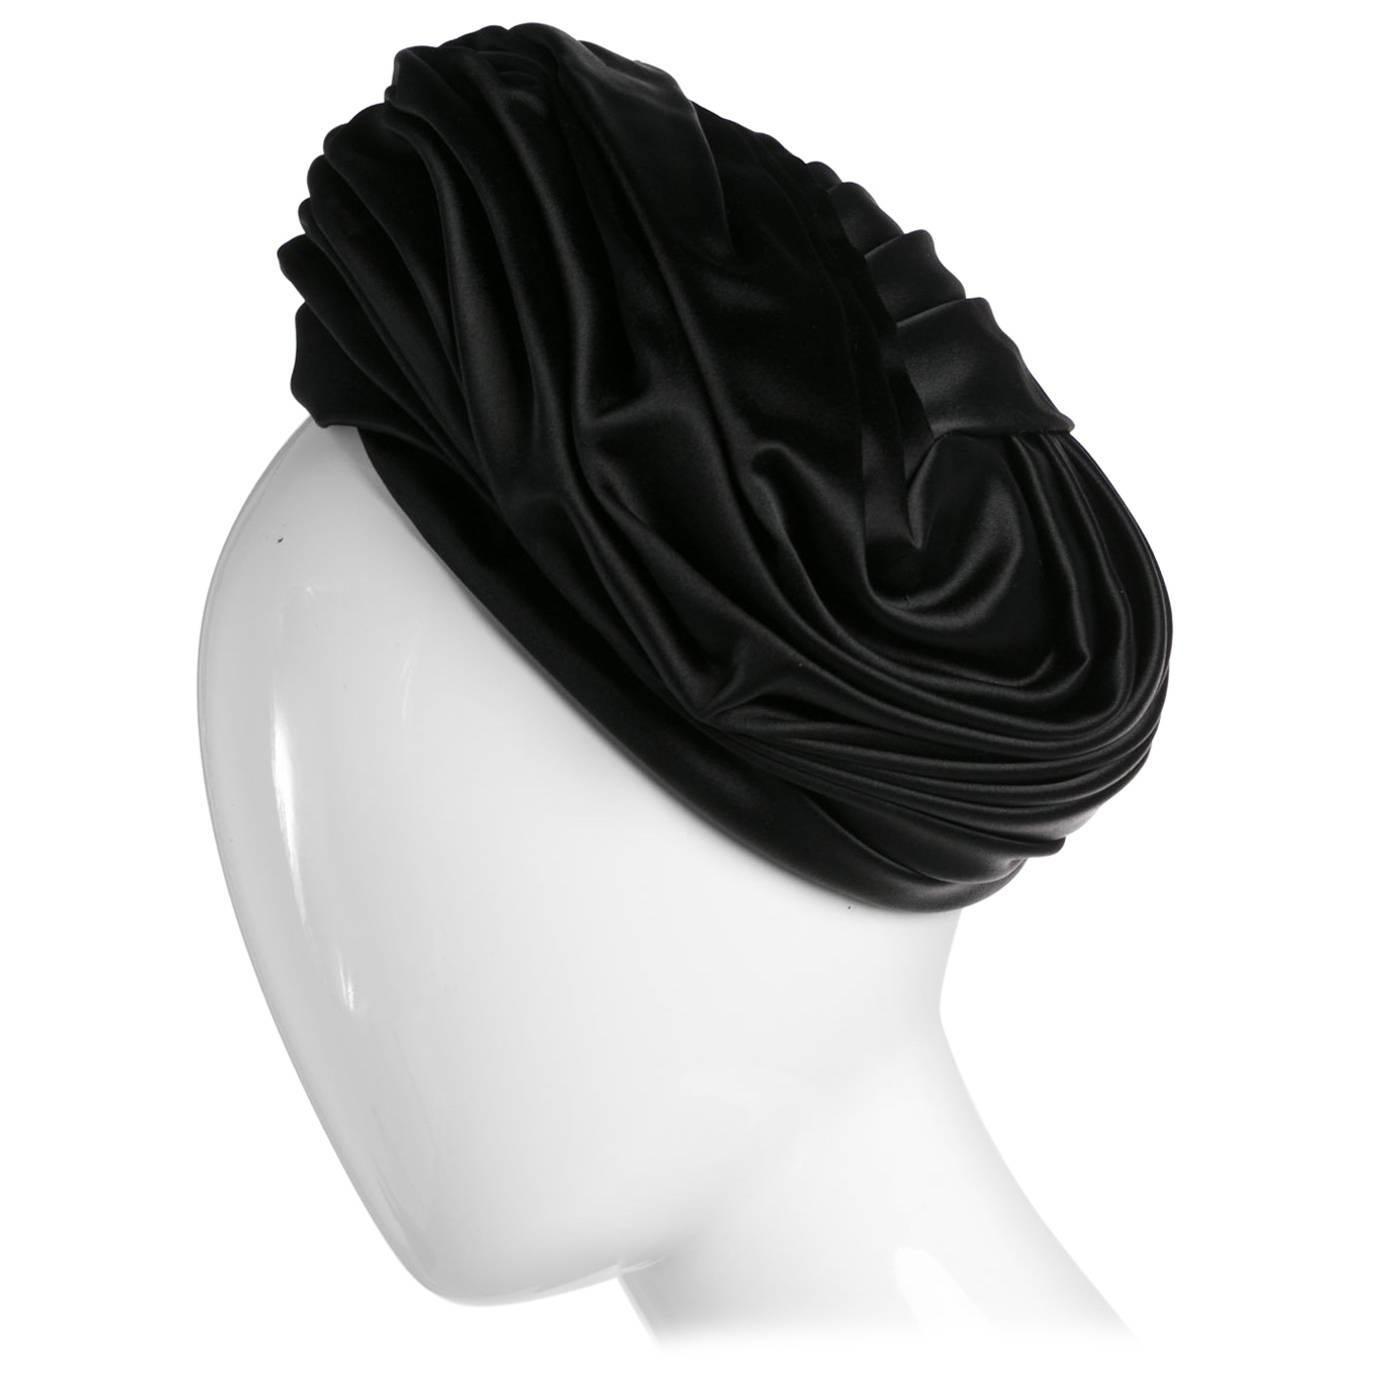 1873cdecaf3 Silk Turbans - 24 For Sale on 1stdibs